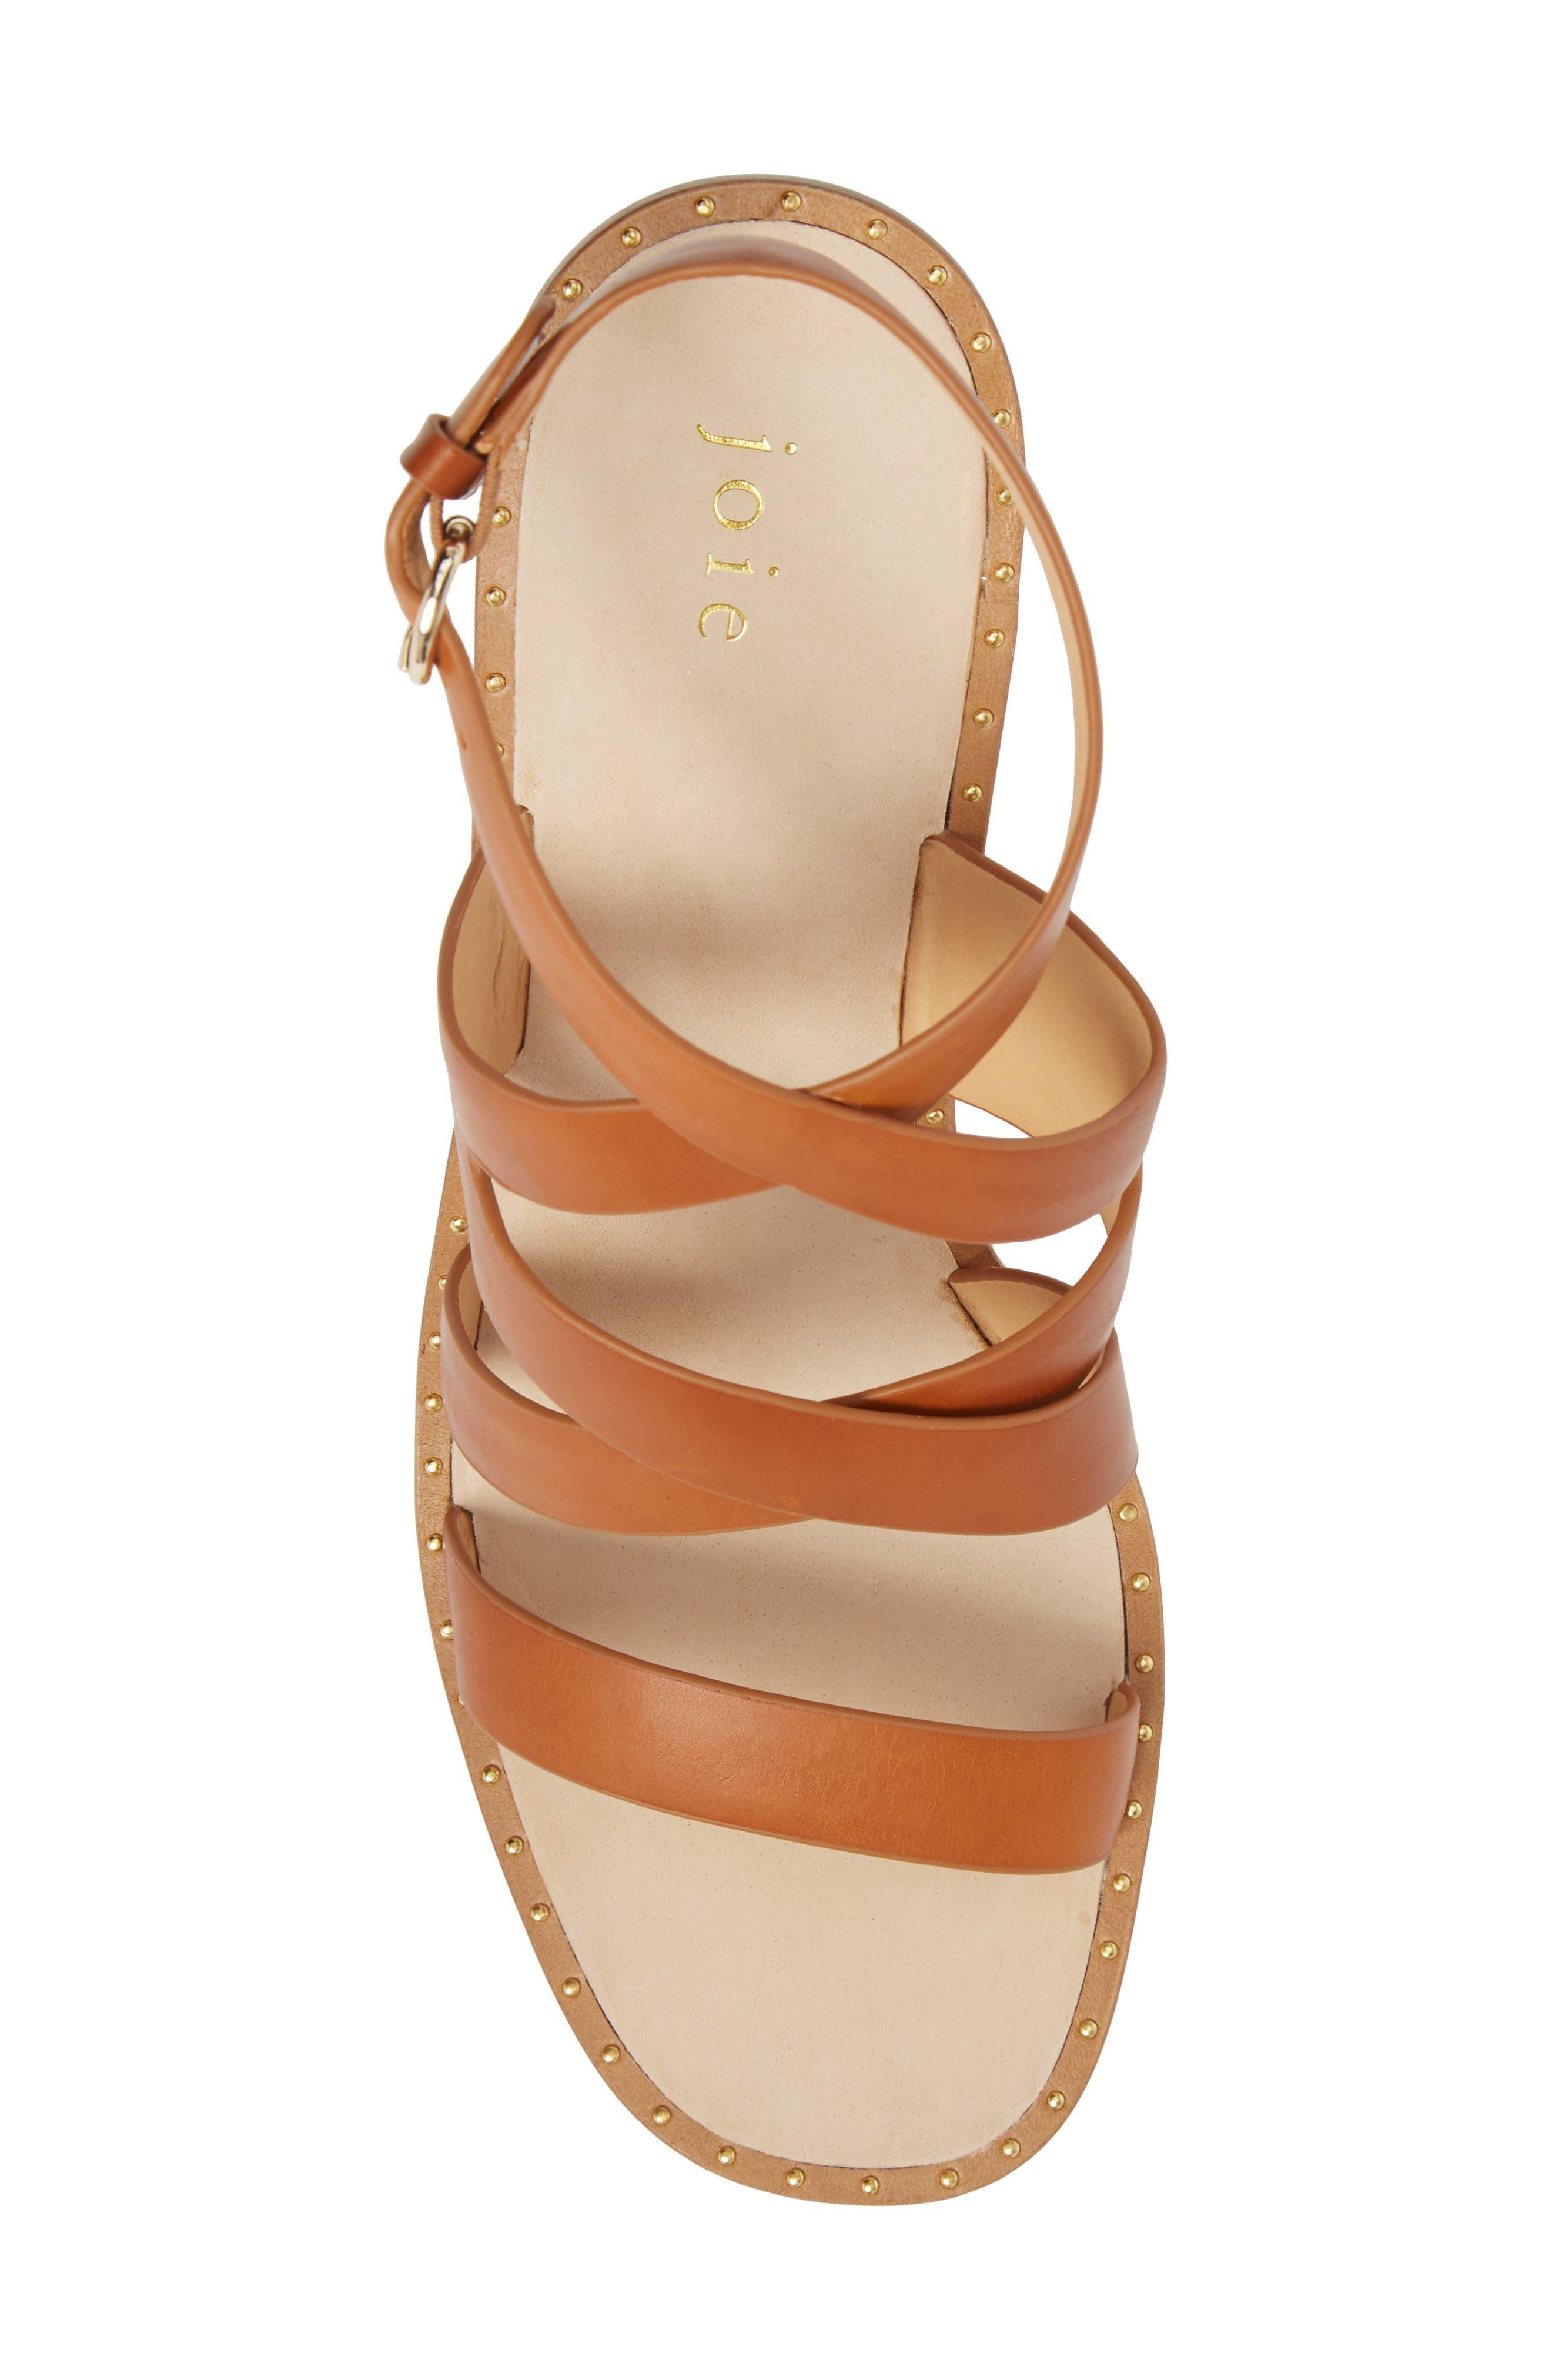 Onfer Studded Strappy Sandal,                             Alternate thumbnail 5, color,                             Tan